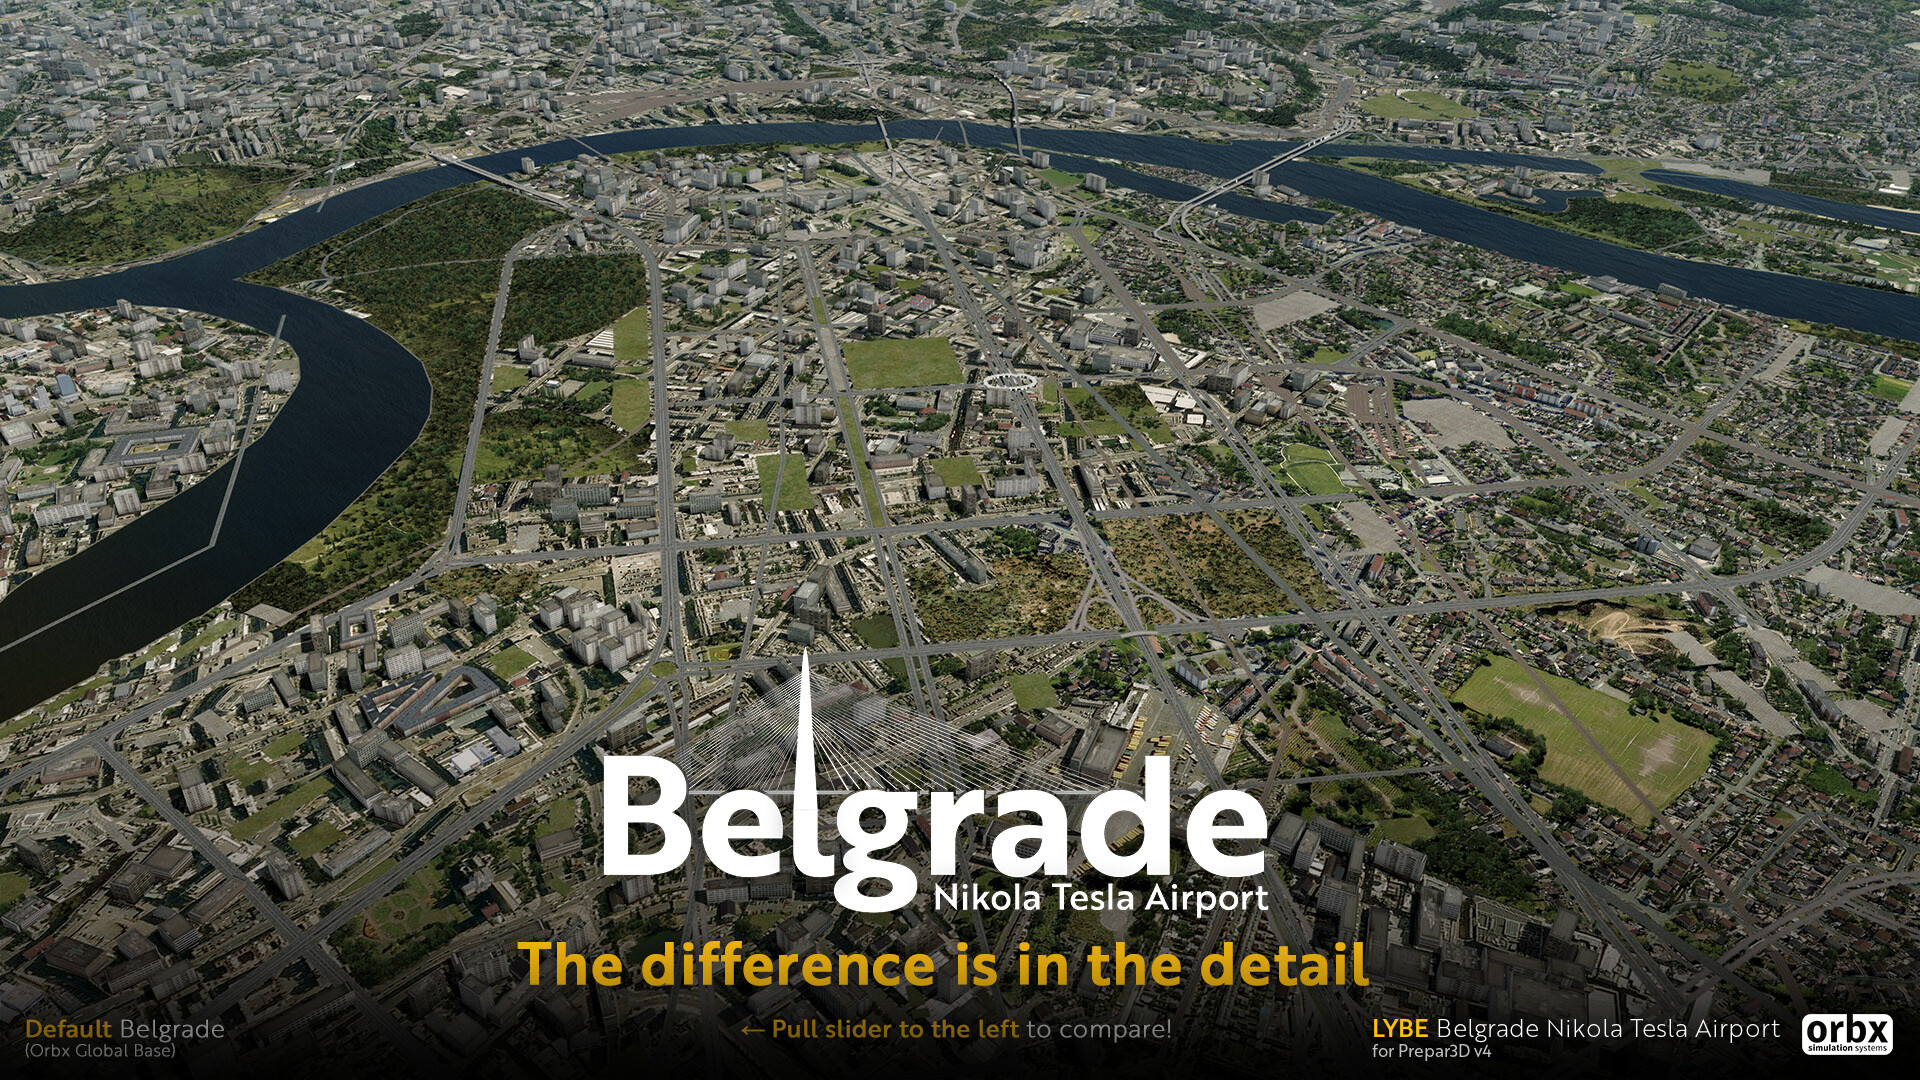 announcement] Introducing LYBE Belgrade Nikola Tesla Airport